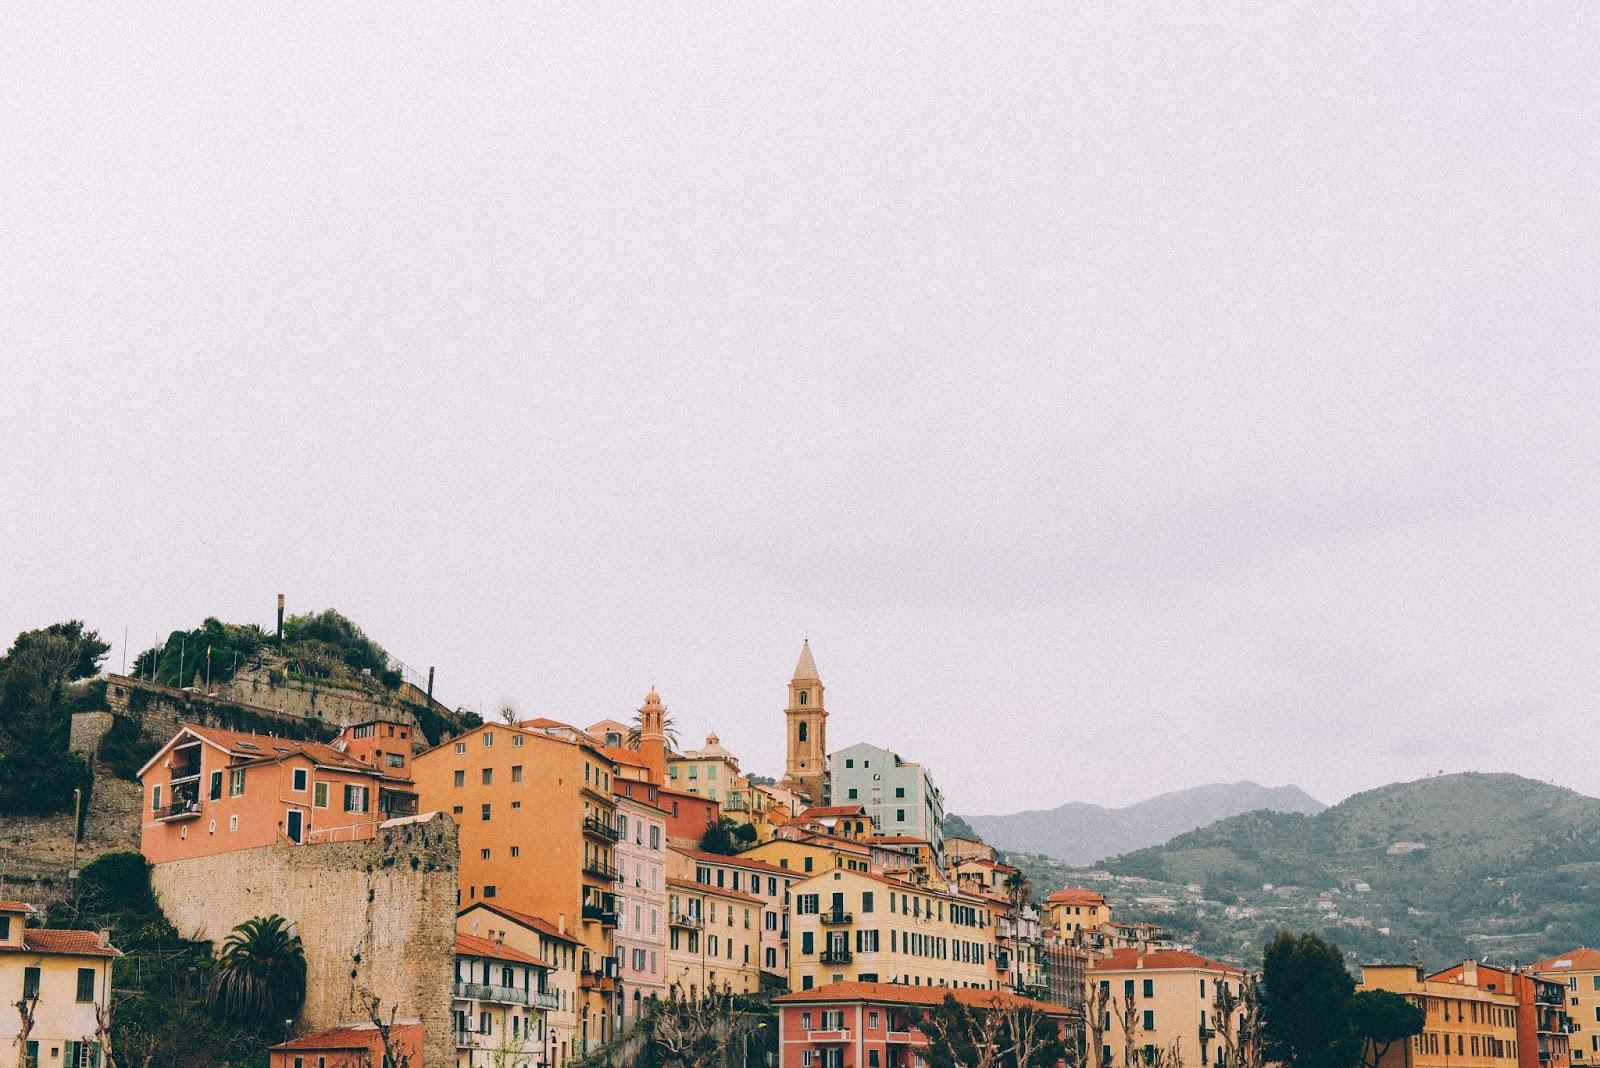 Vue de Ventimiglia